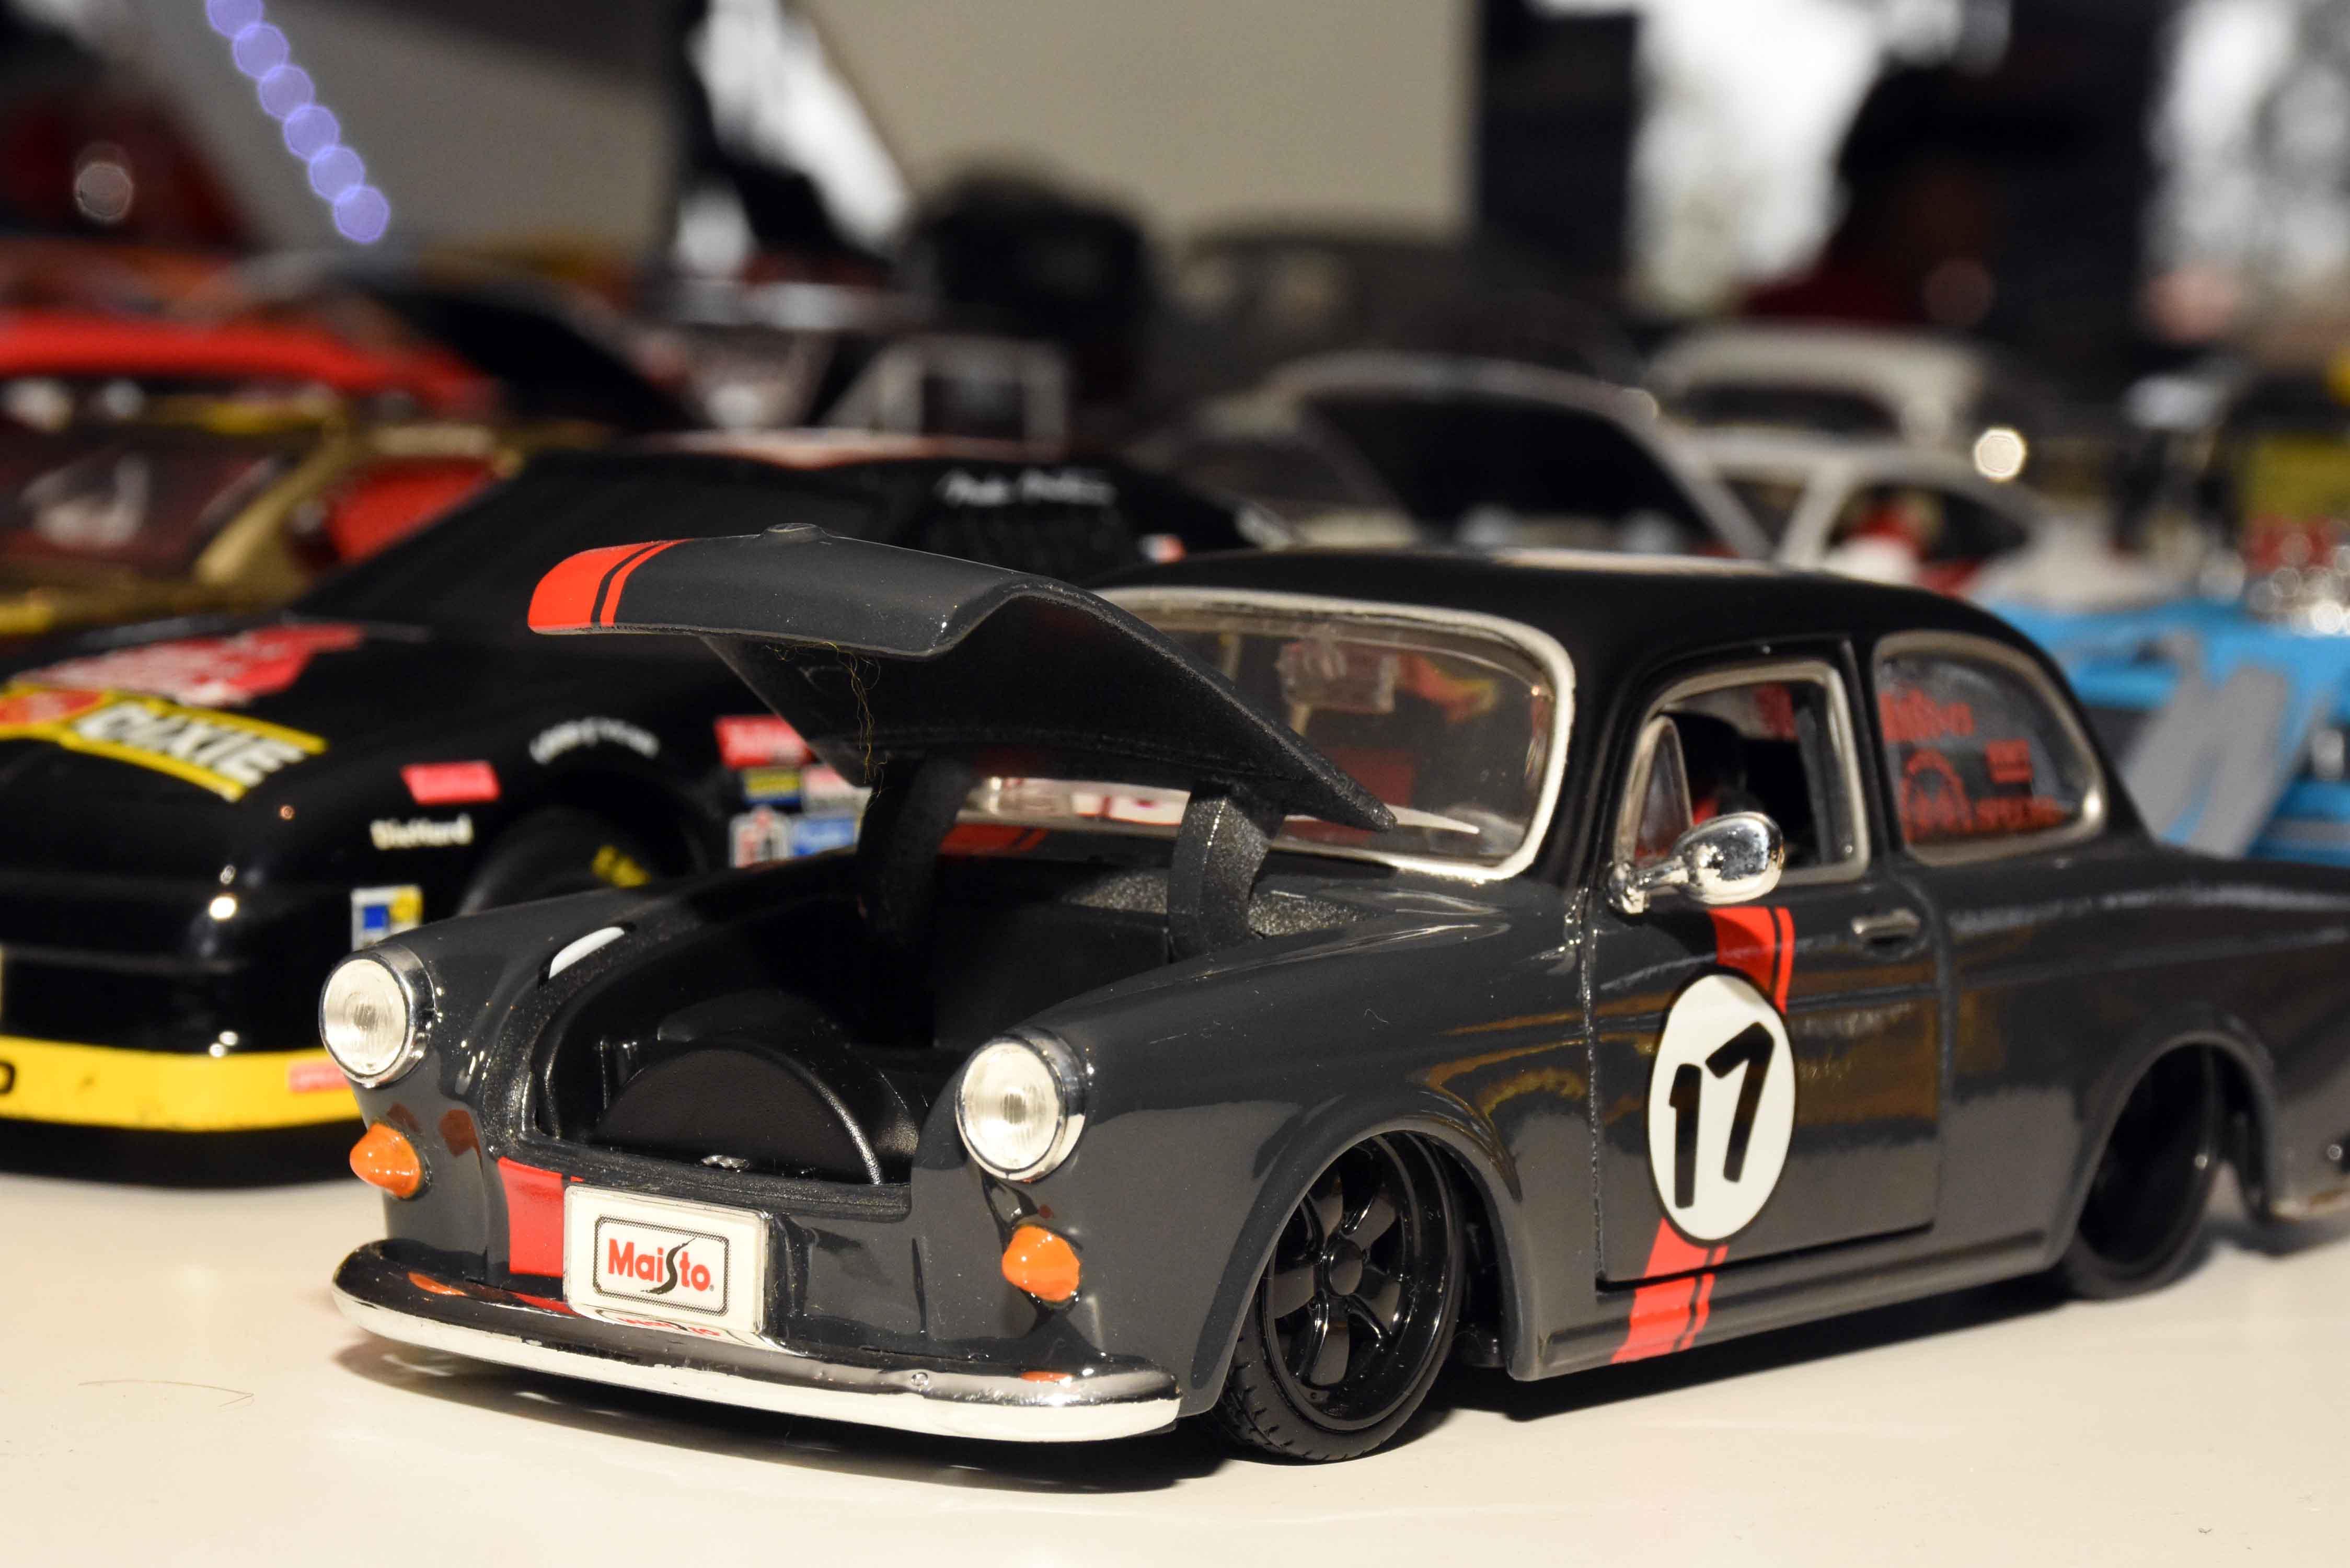 Exposición de autos a escala en La Barraca (20)